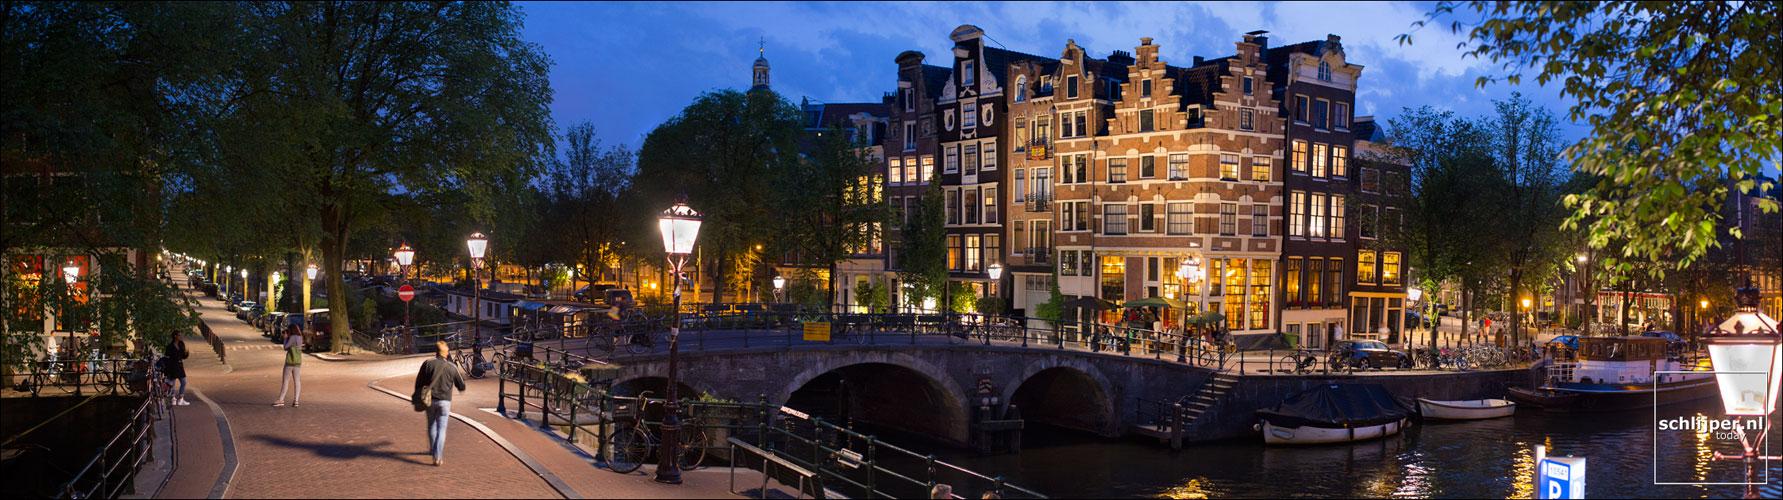 Nederland, Amsterdam, 14 juli 2013